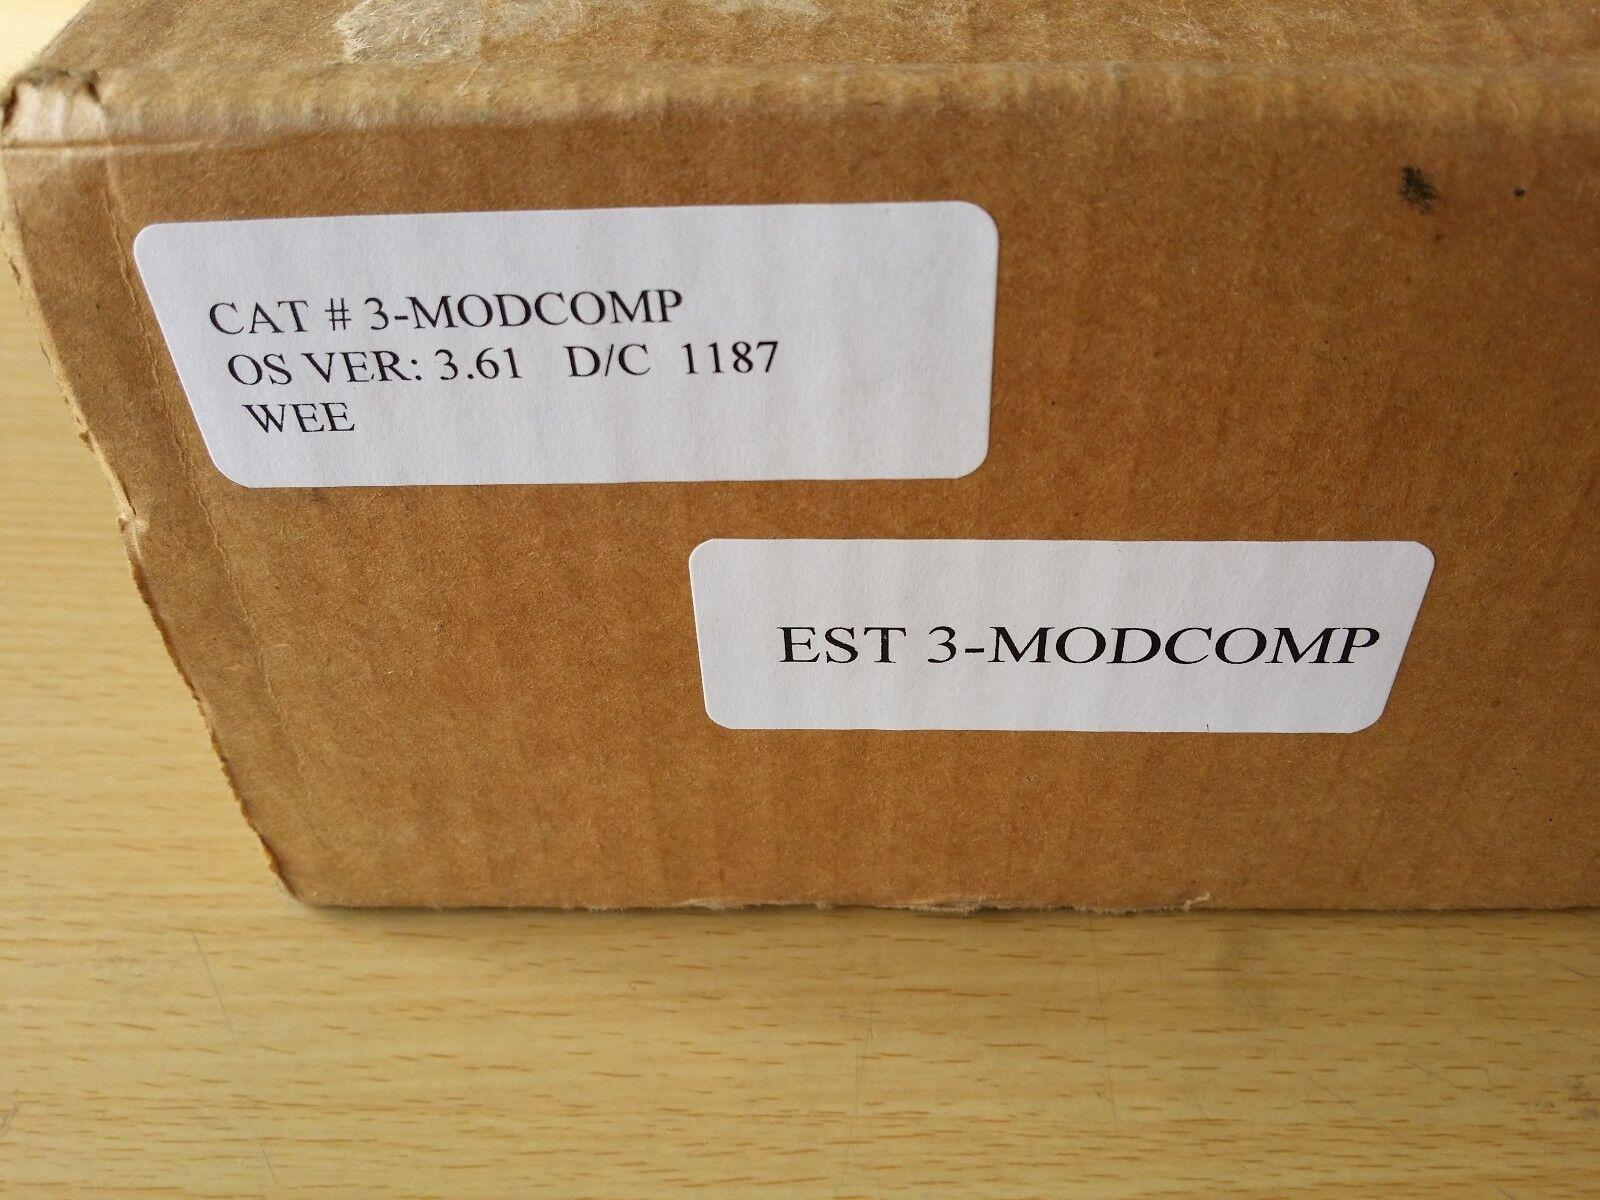 New EDWARDS EST 3-MODCOMP  MODEM / COMMUNICATOR (DACT) PAGER INTERFACE